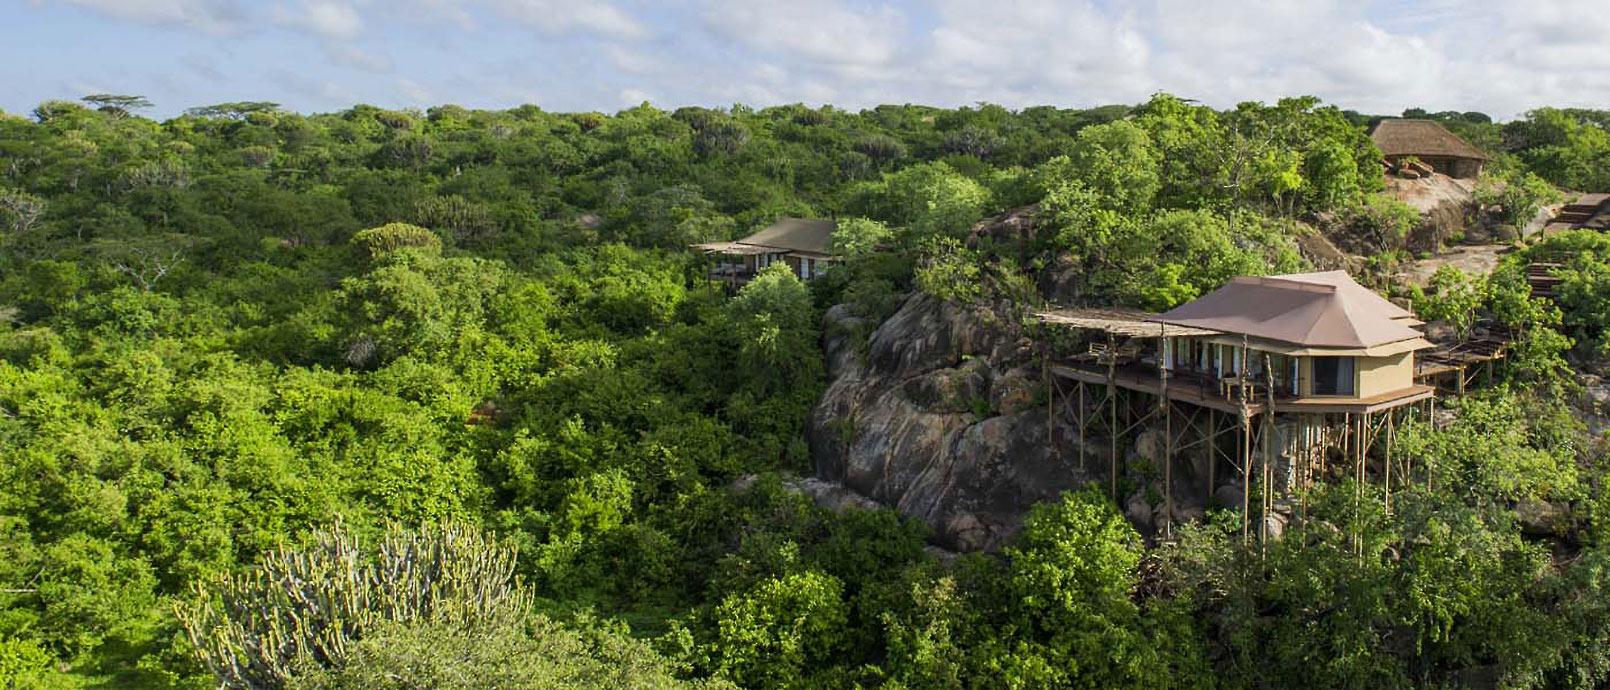 Le Mwiba lodge, en Tanzanie Luxe et charme au cœur de la savane